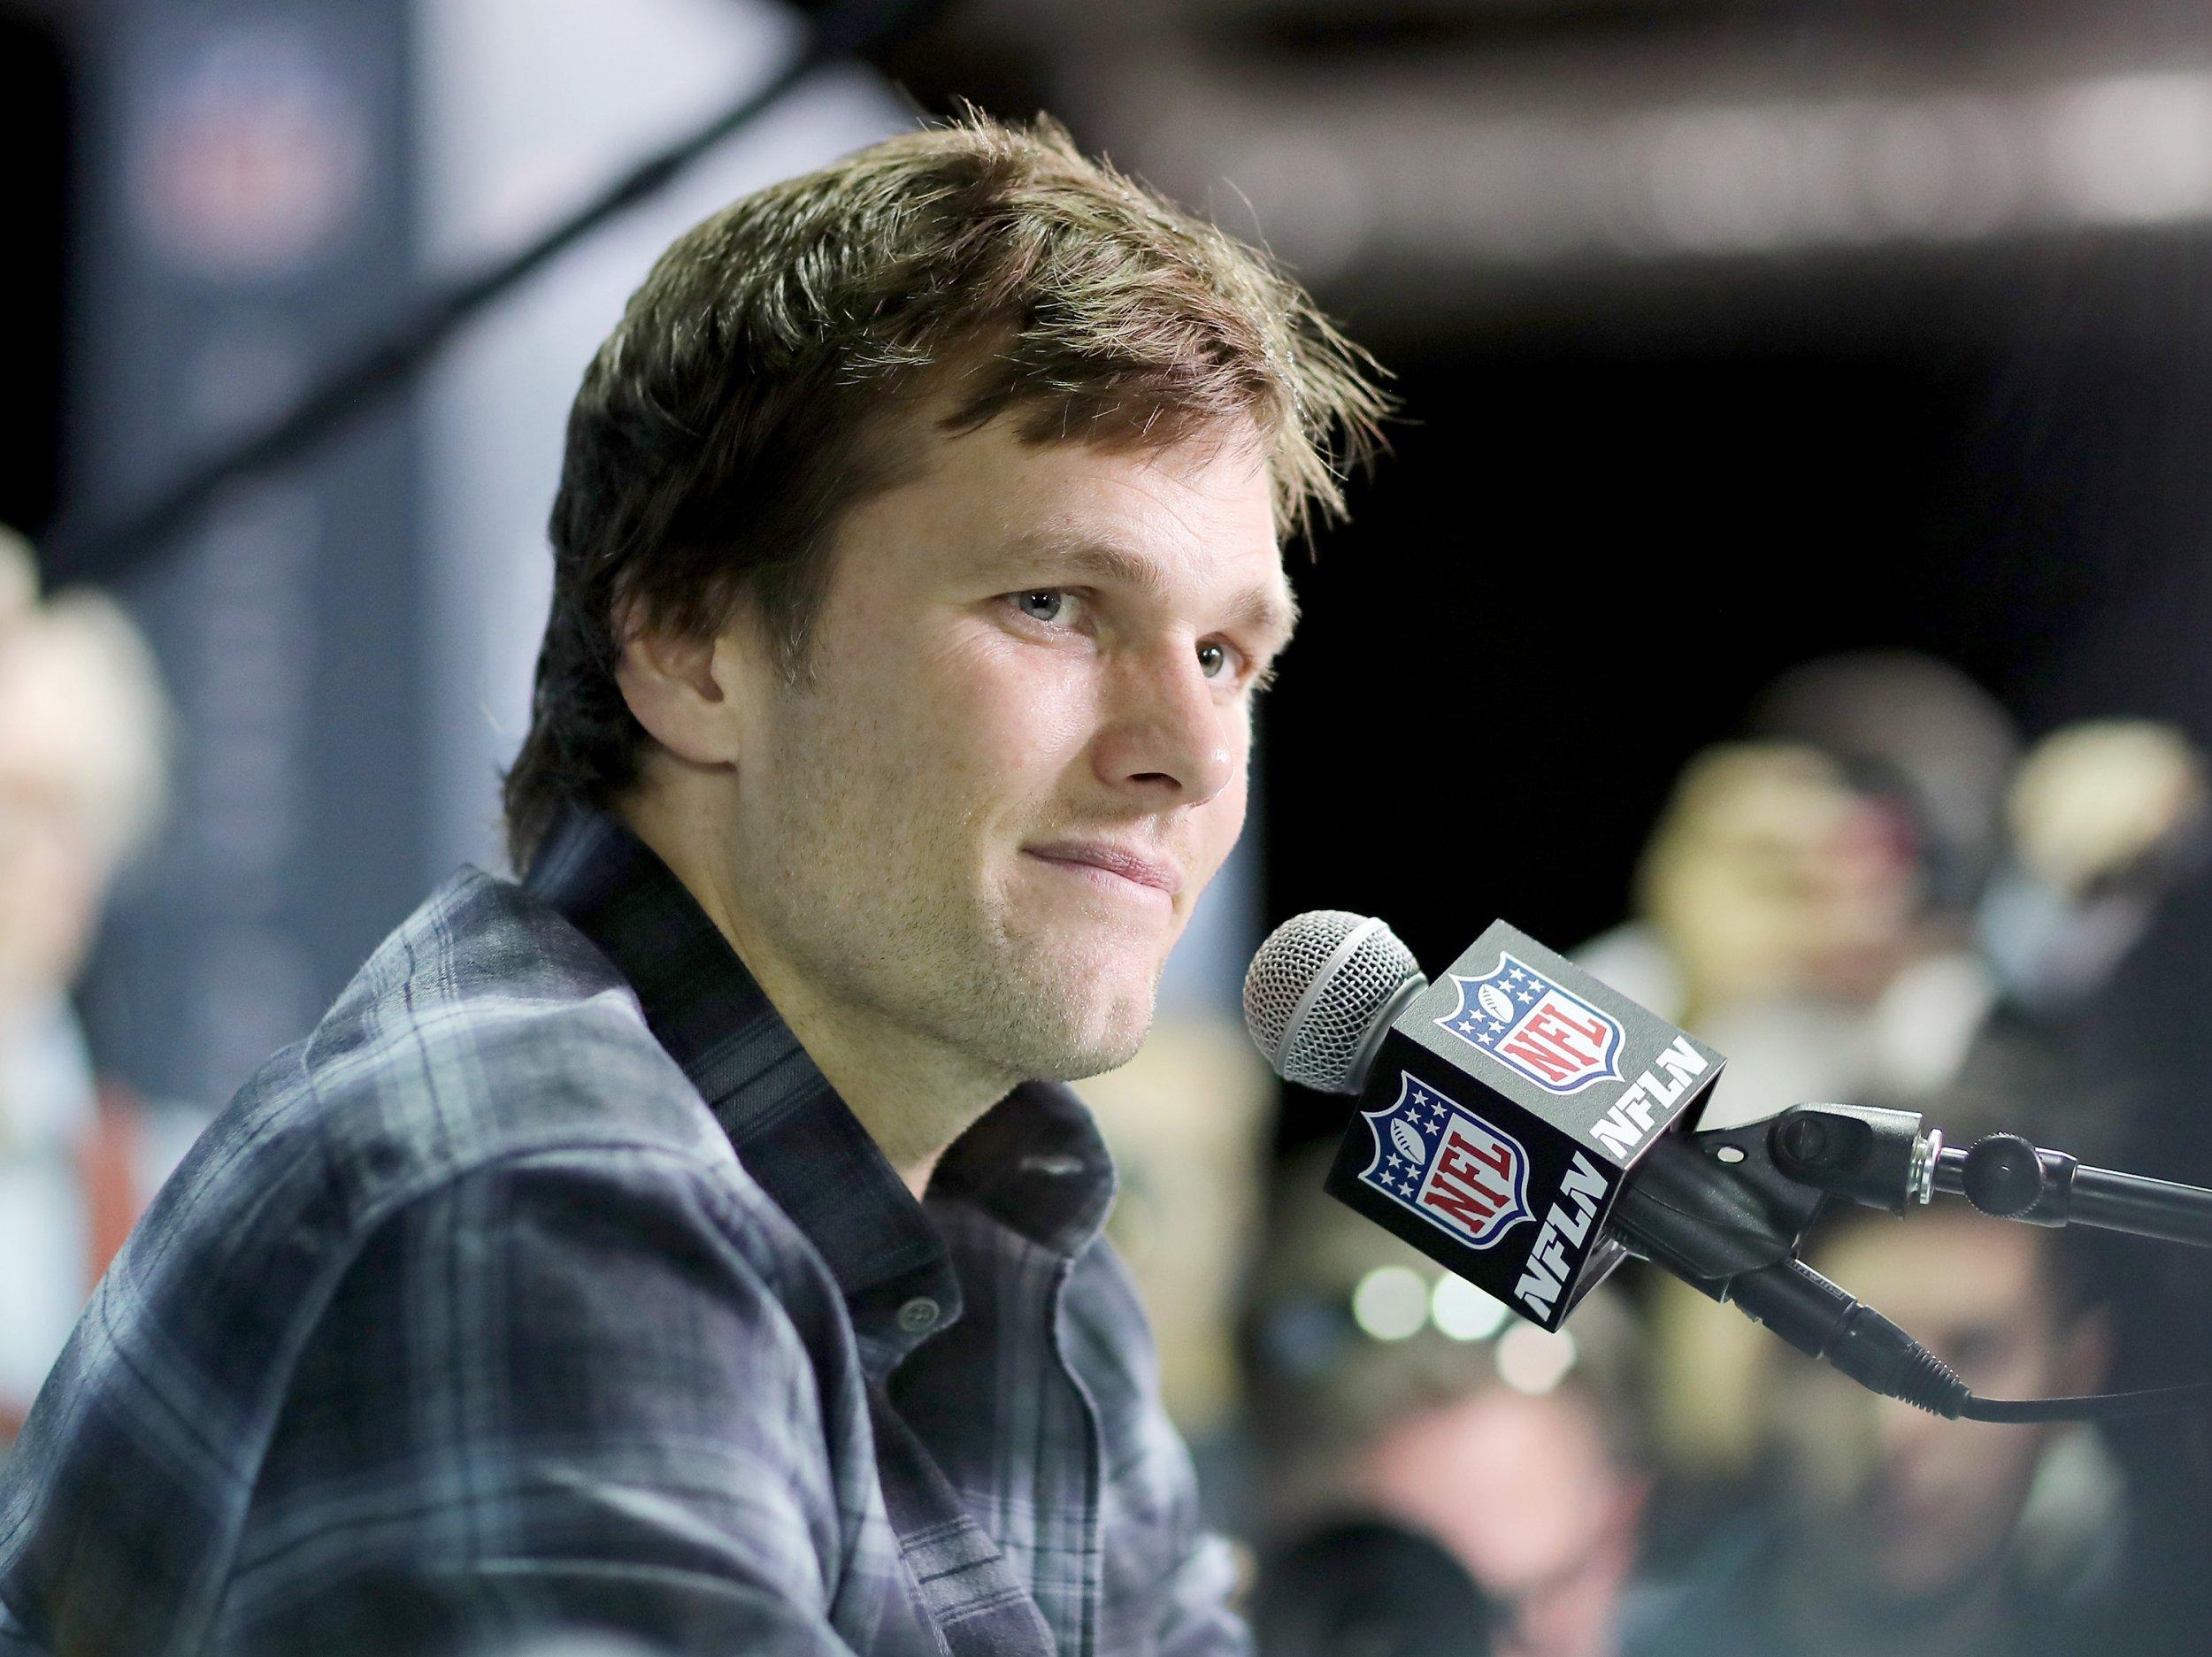 Tom Brady of the New England Patriots in Bloomington, Minnesota, February 1.